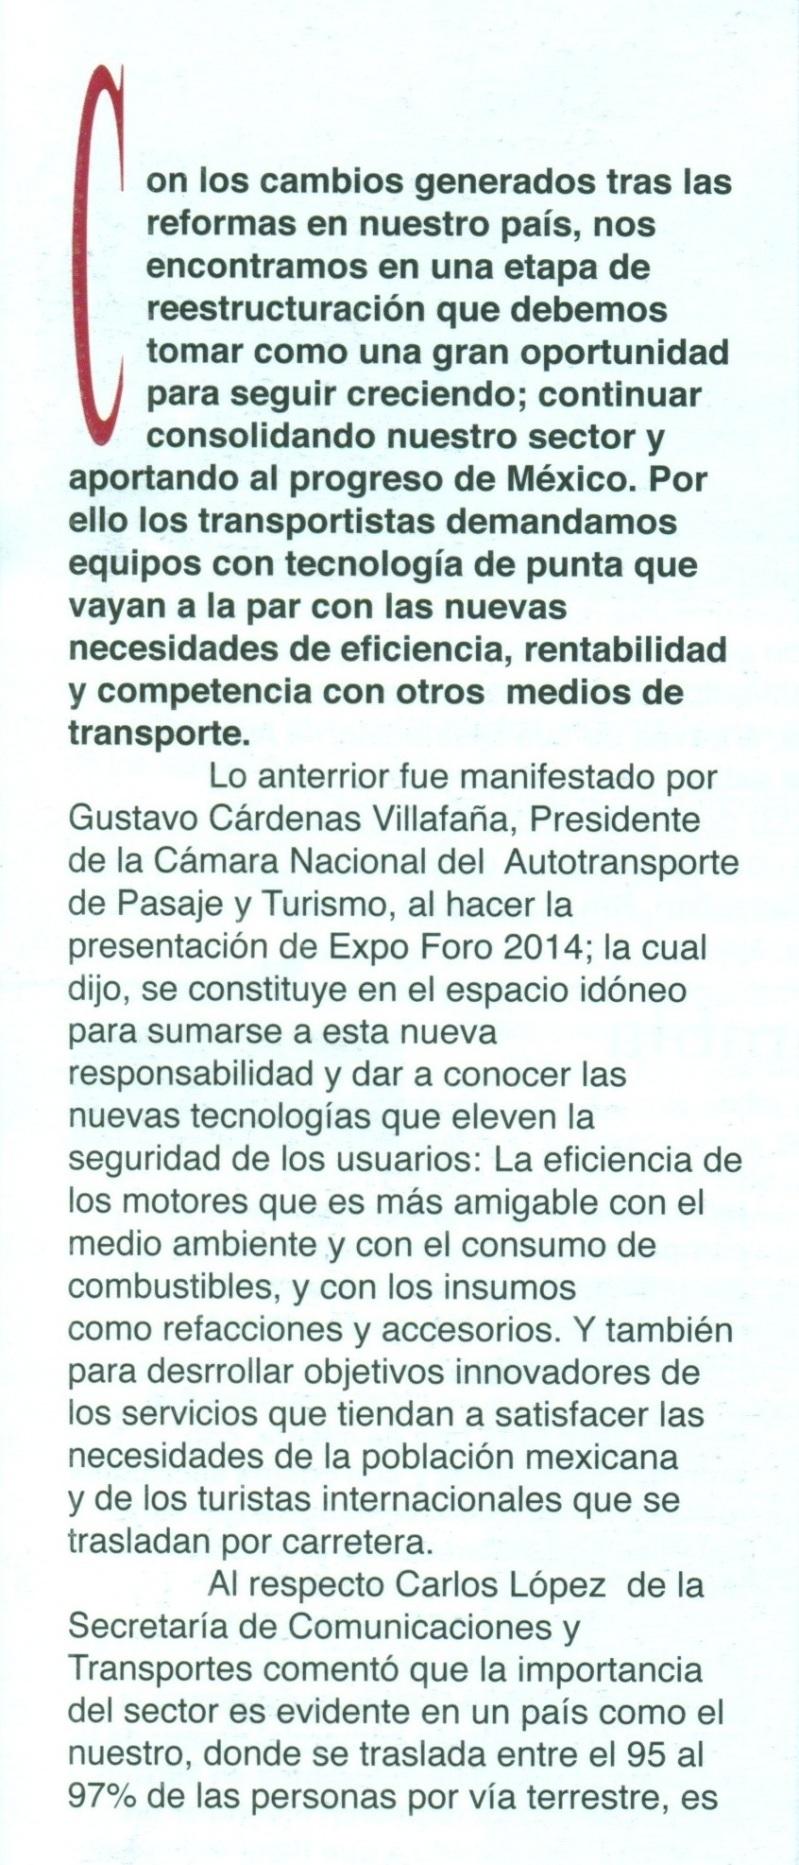 Revista %22Mundo Empresarial%22 Marzo 2014 Pag. 38A